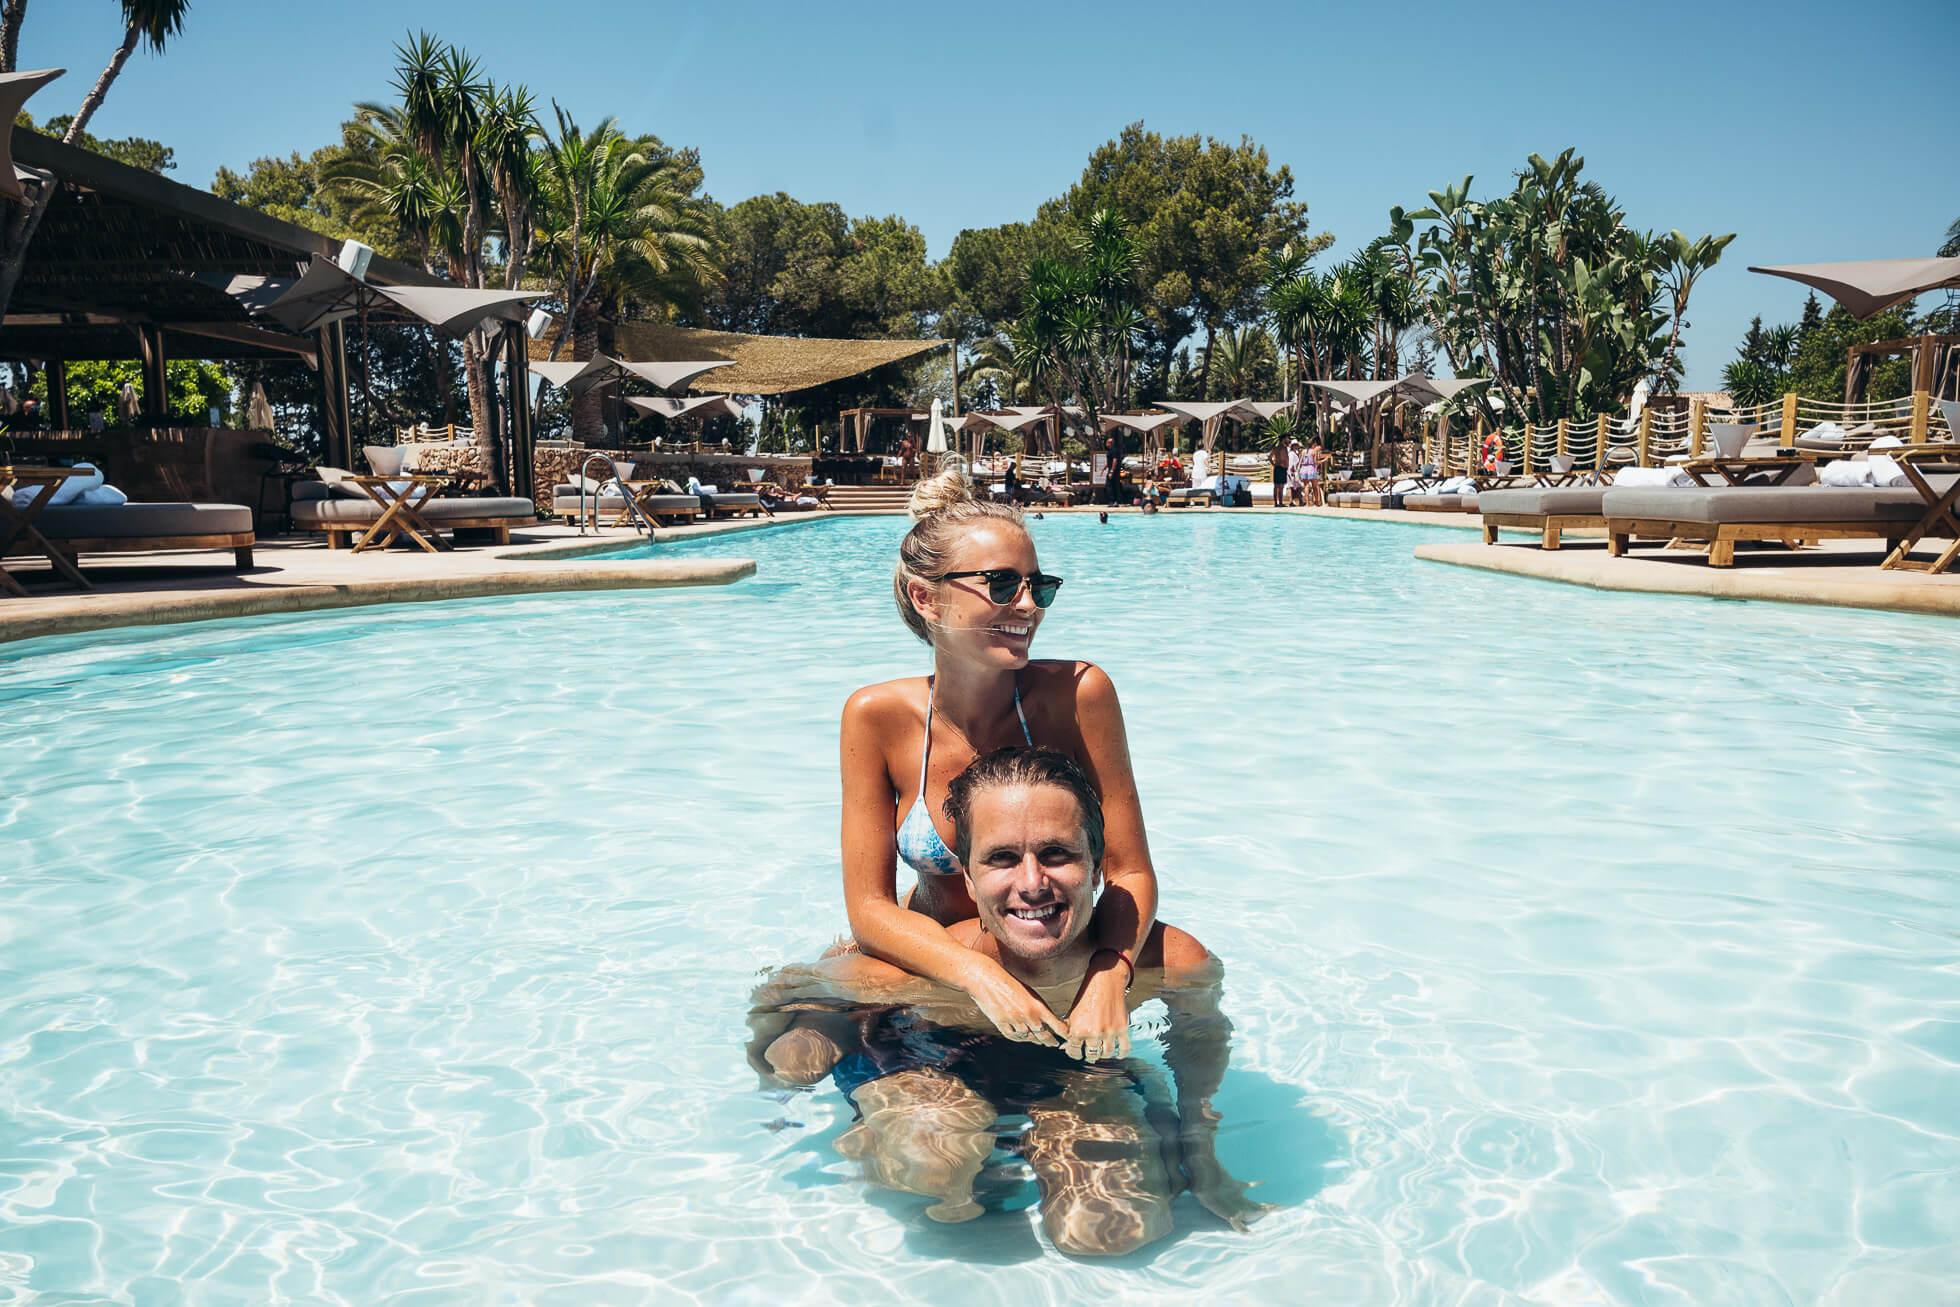 janni-deler-nao-poolclub-marbellaJ1160379